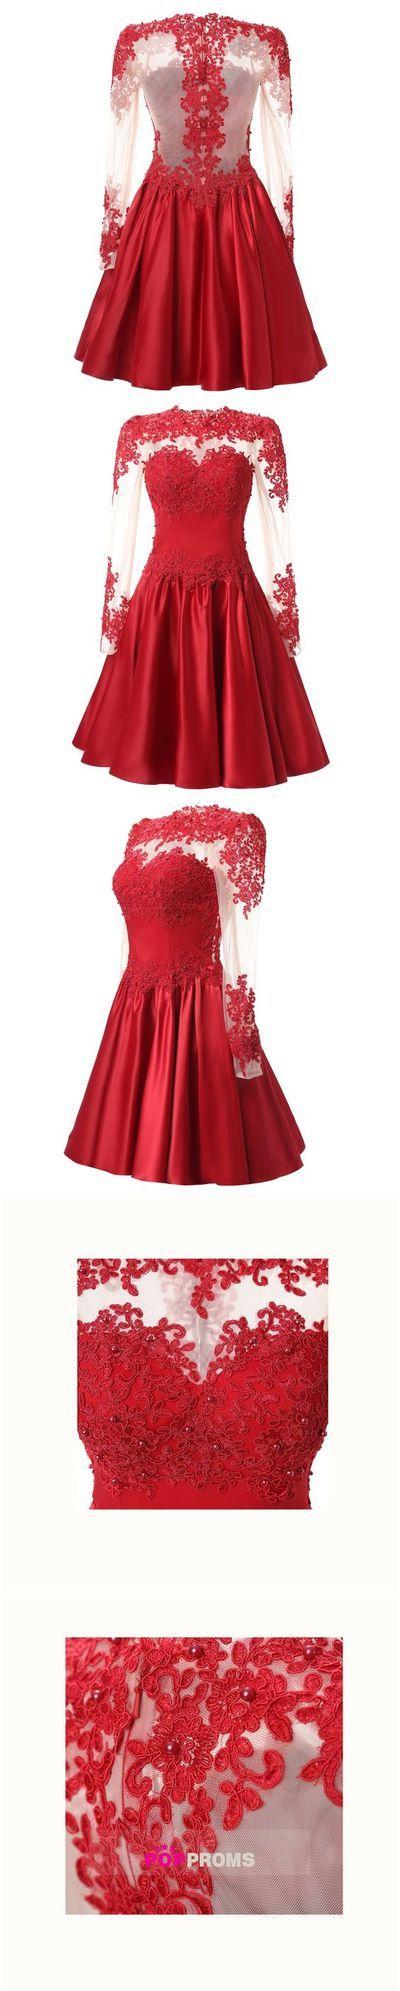 U0020, A-line homecoming dresses, Cute homecoing dresses,High neck homecoming dresses, Long sleeve prom dresses